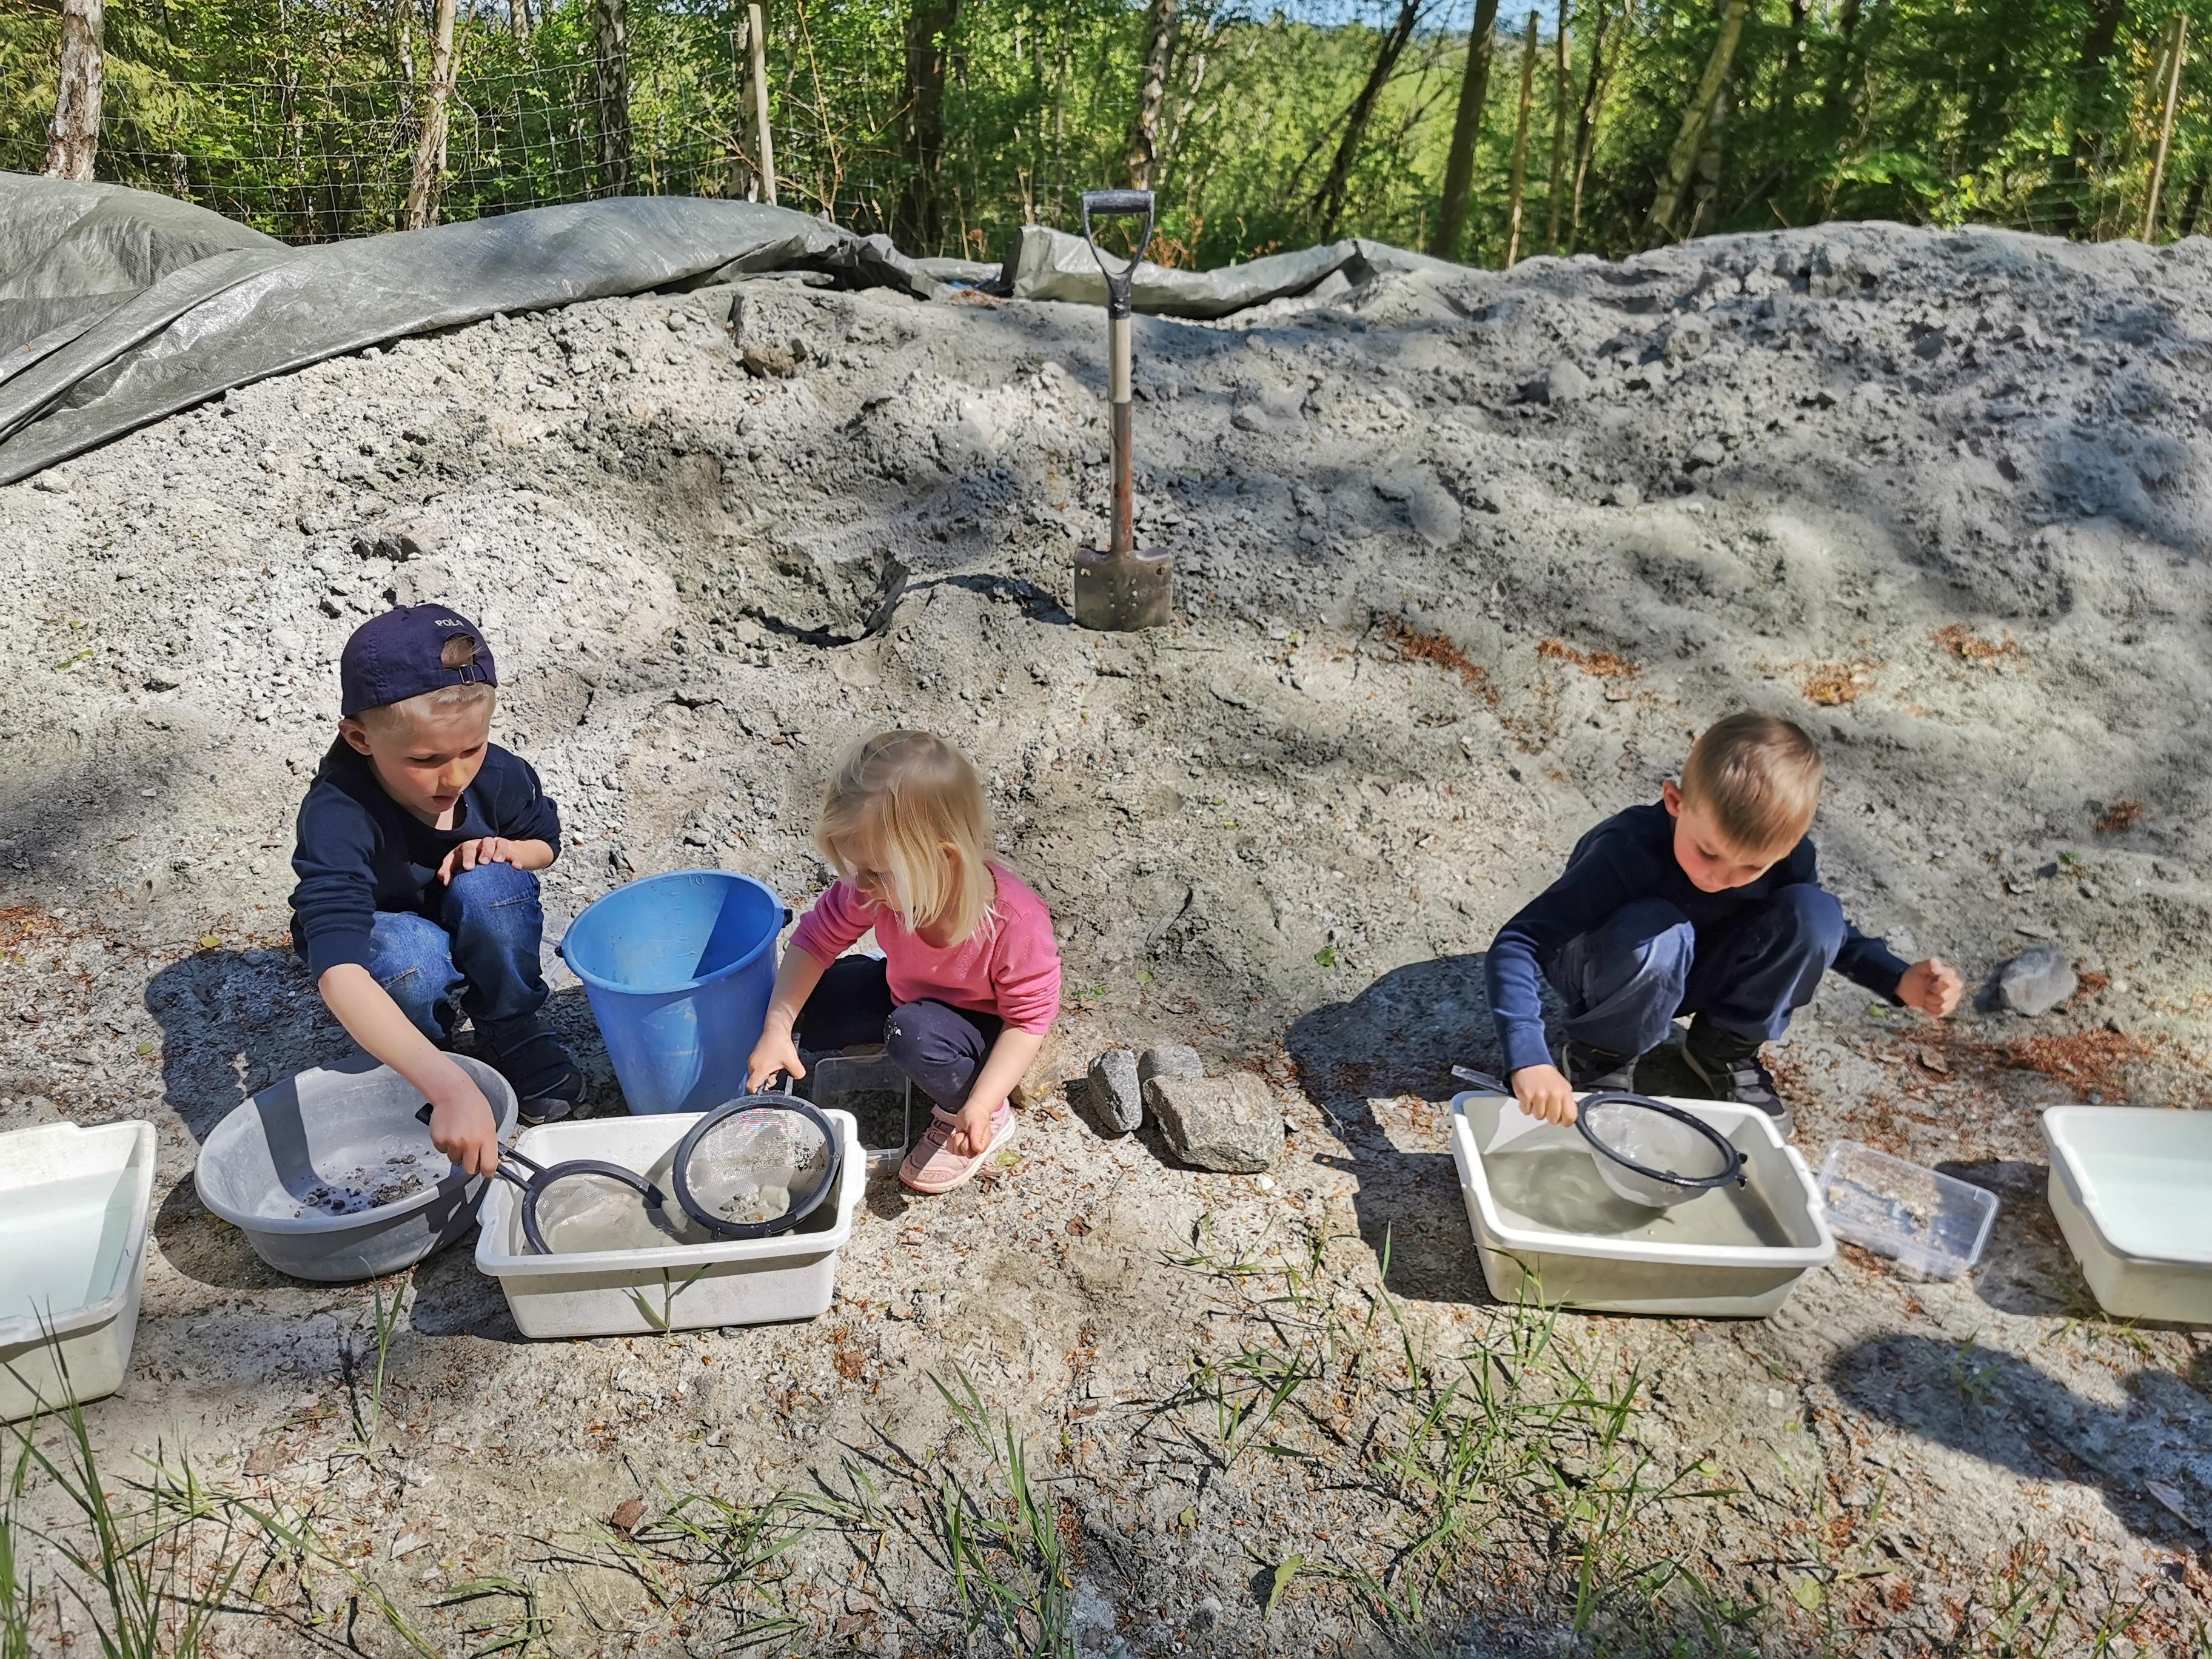 Leta fossil i Sverige